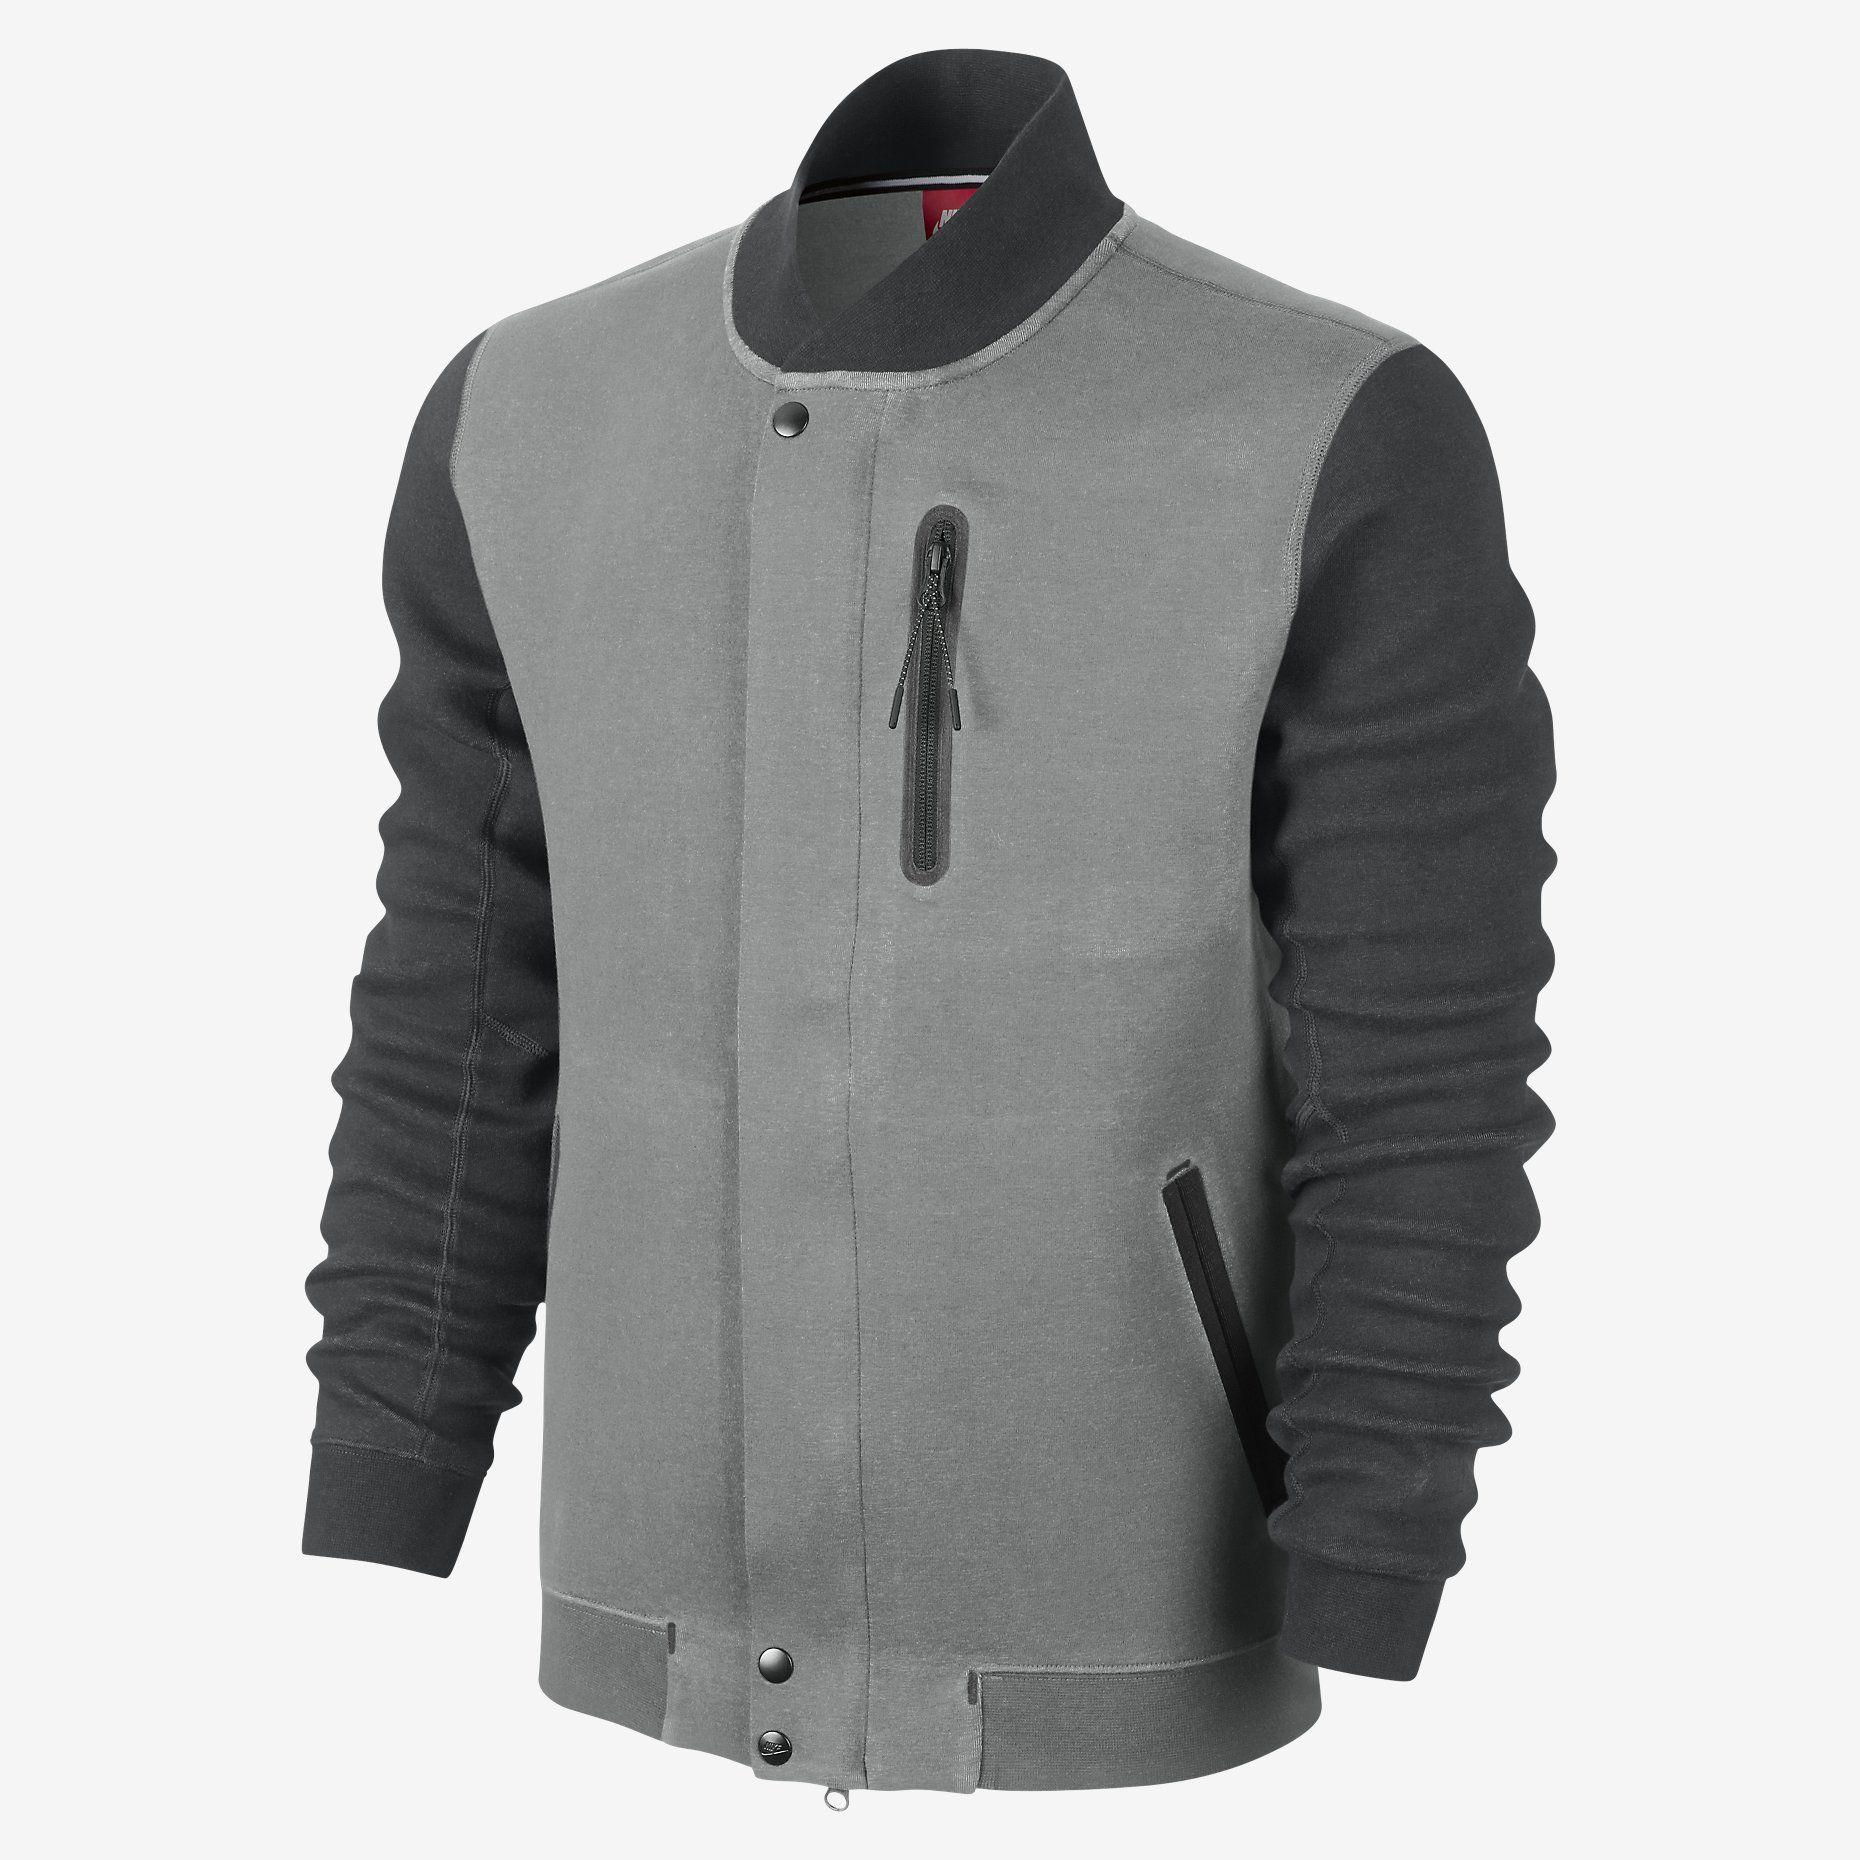 quality design 8afb4 b60de Nike Tech Varsity 3mm Mens Jacket. Nike Store